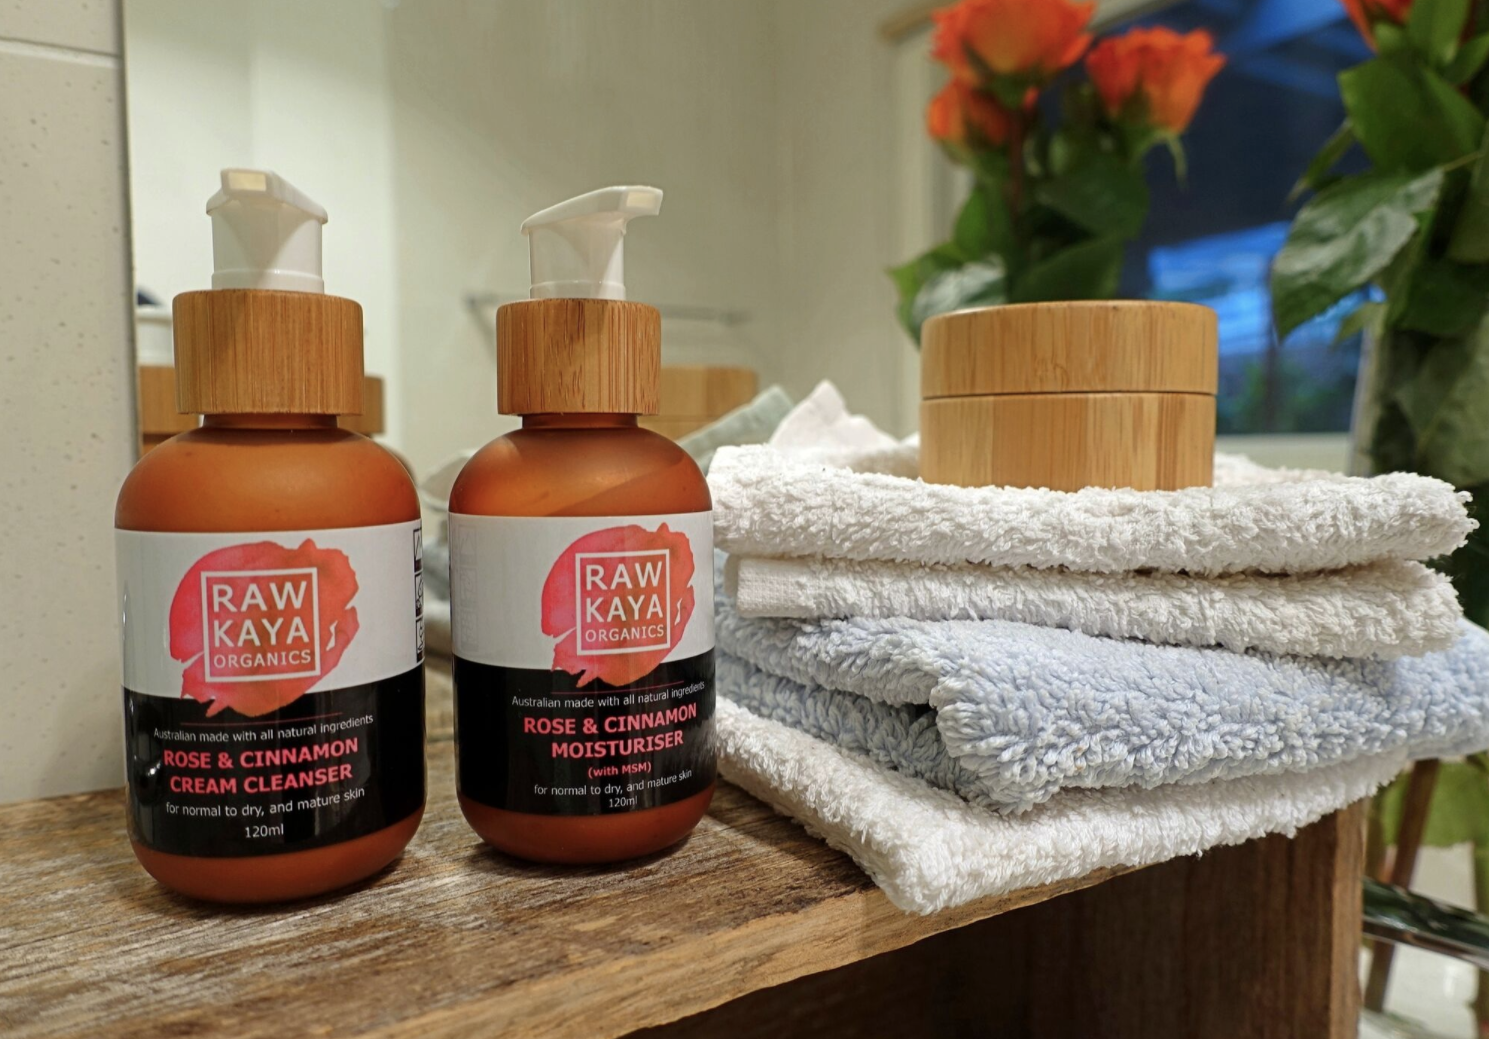 Raw Kaya Organics' Rose + Cinnamon skin food